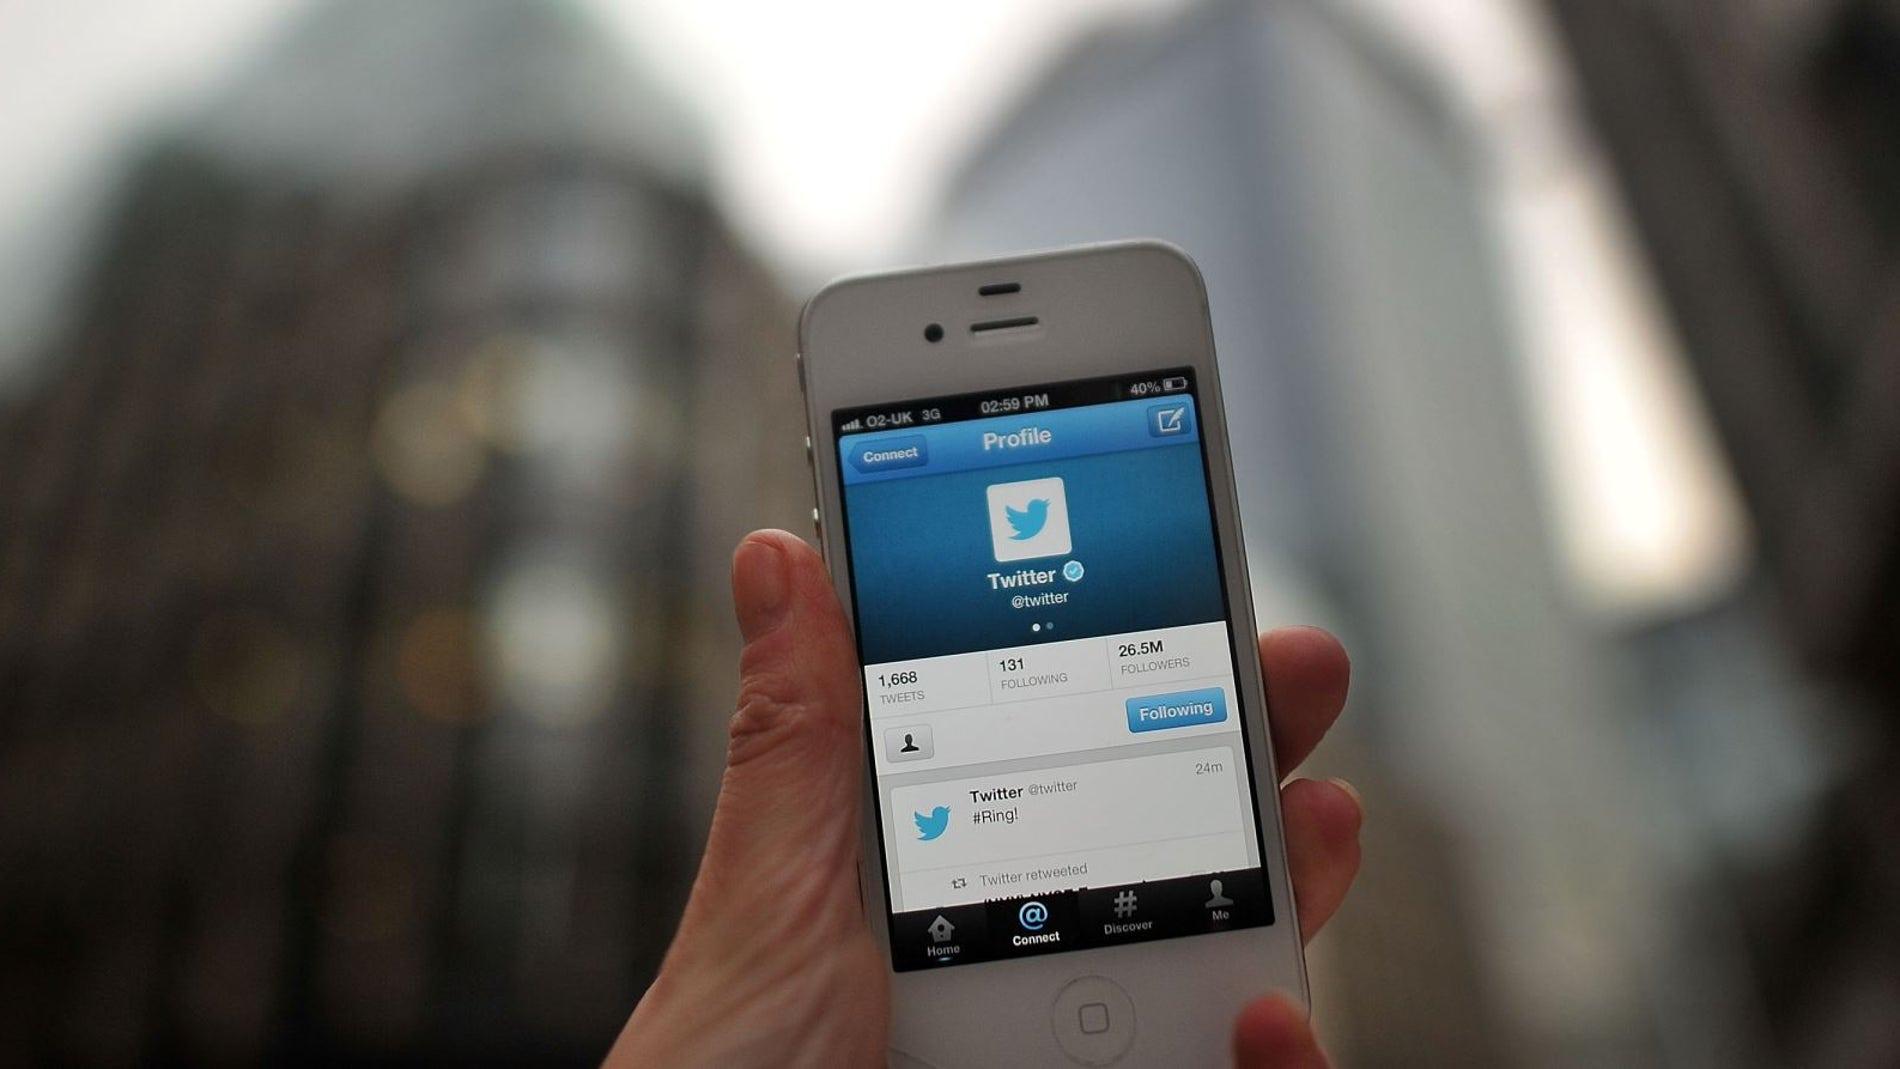 Twitter sabe qué apps usas en tu móvil